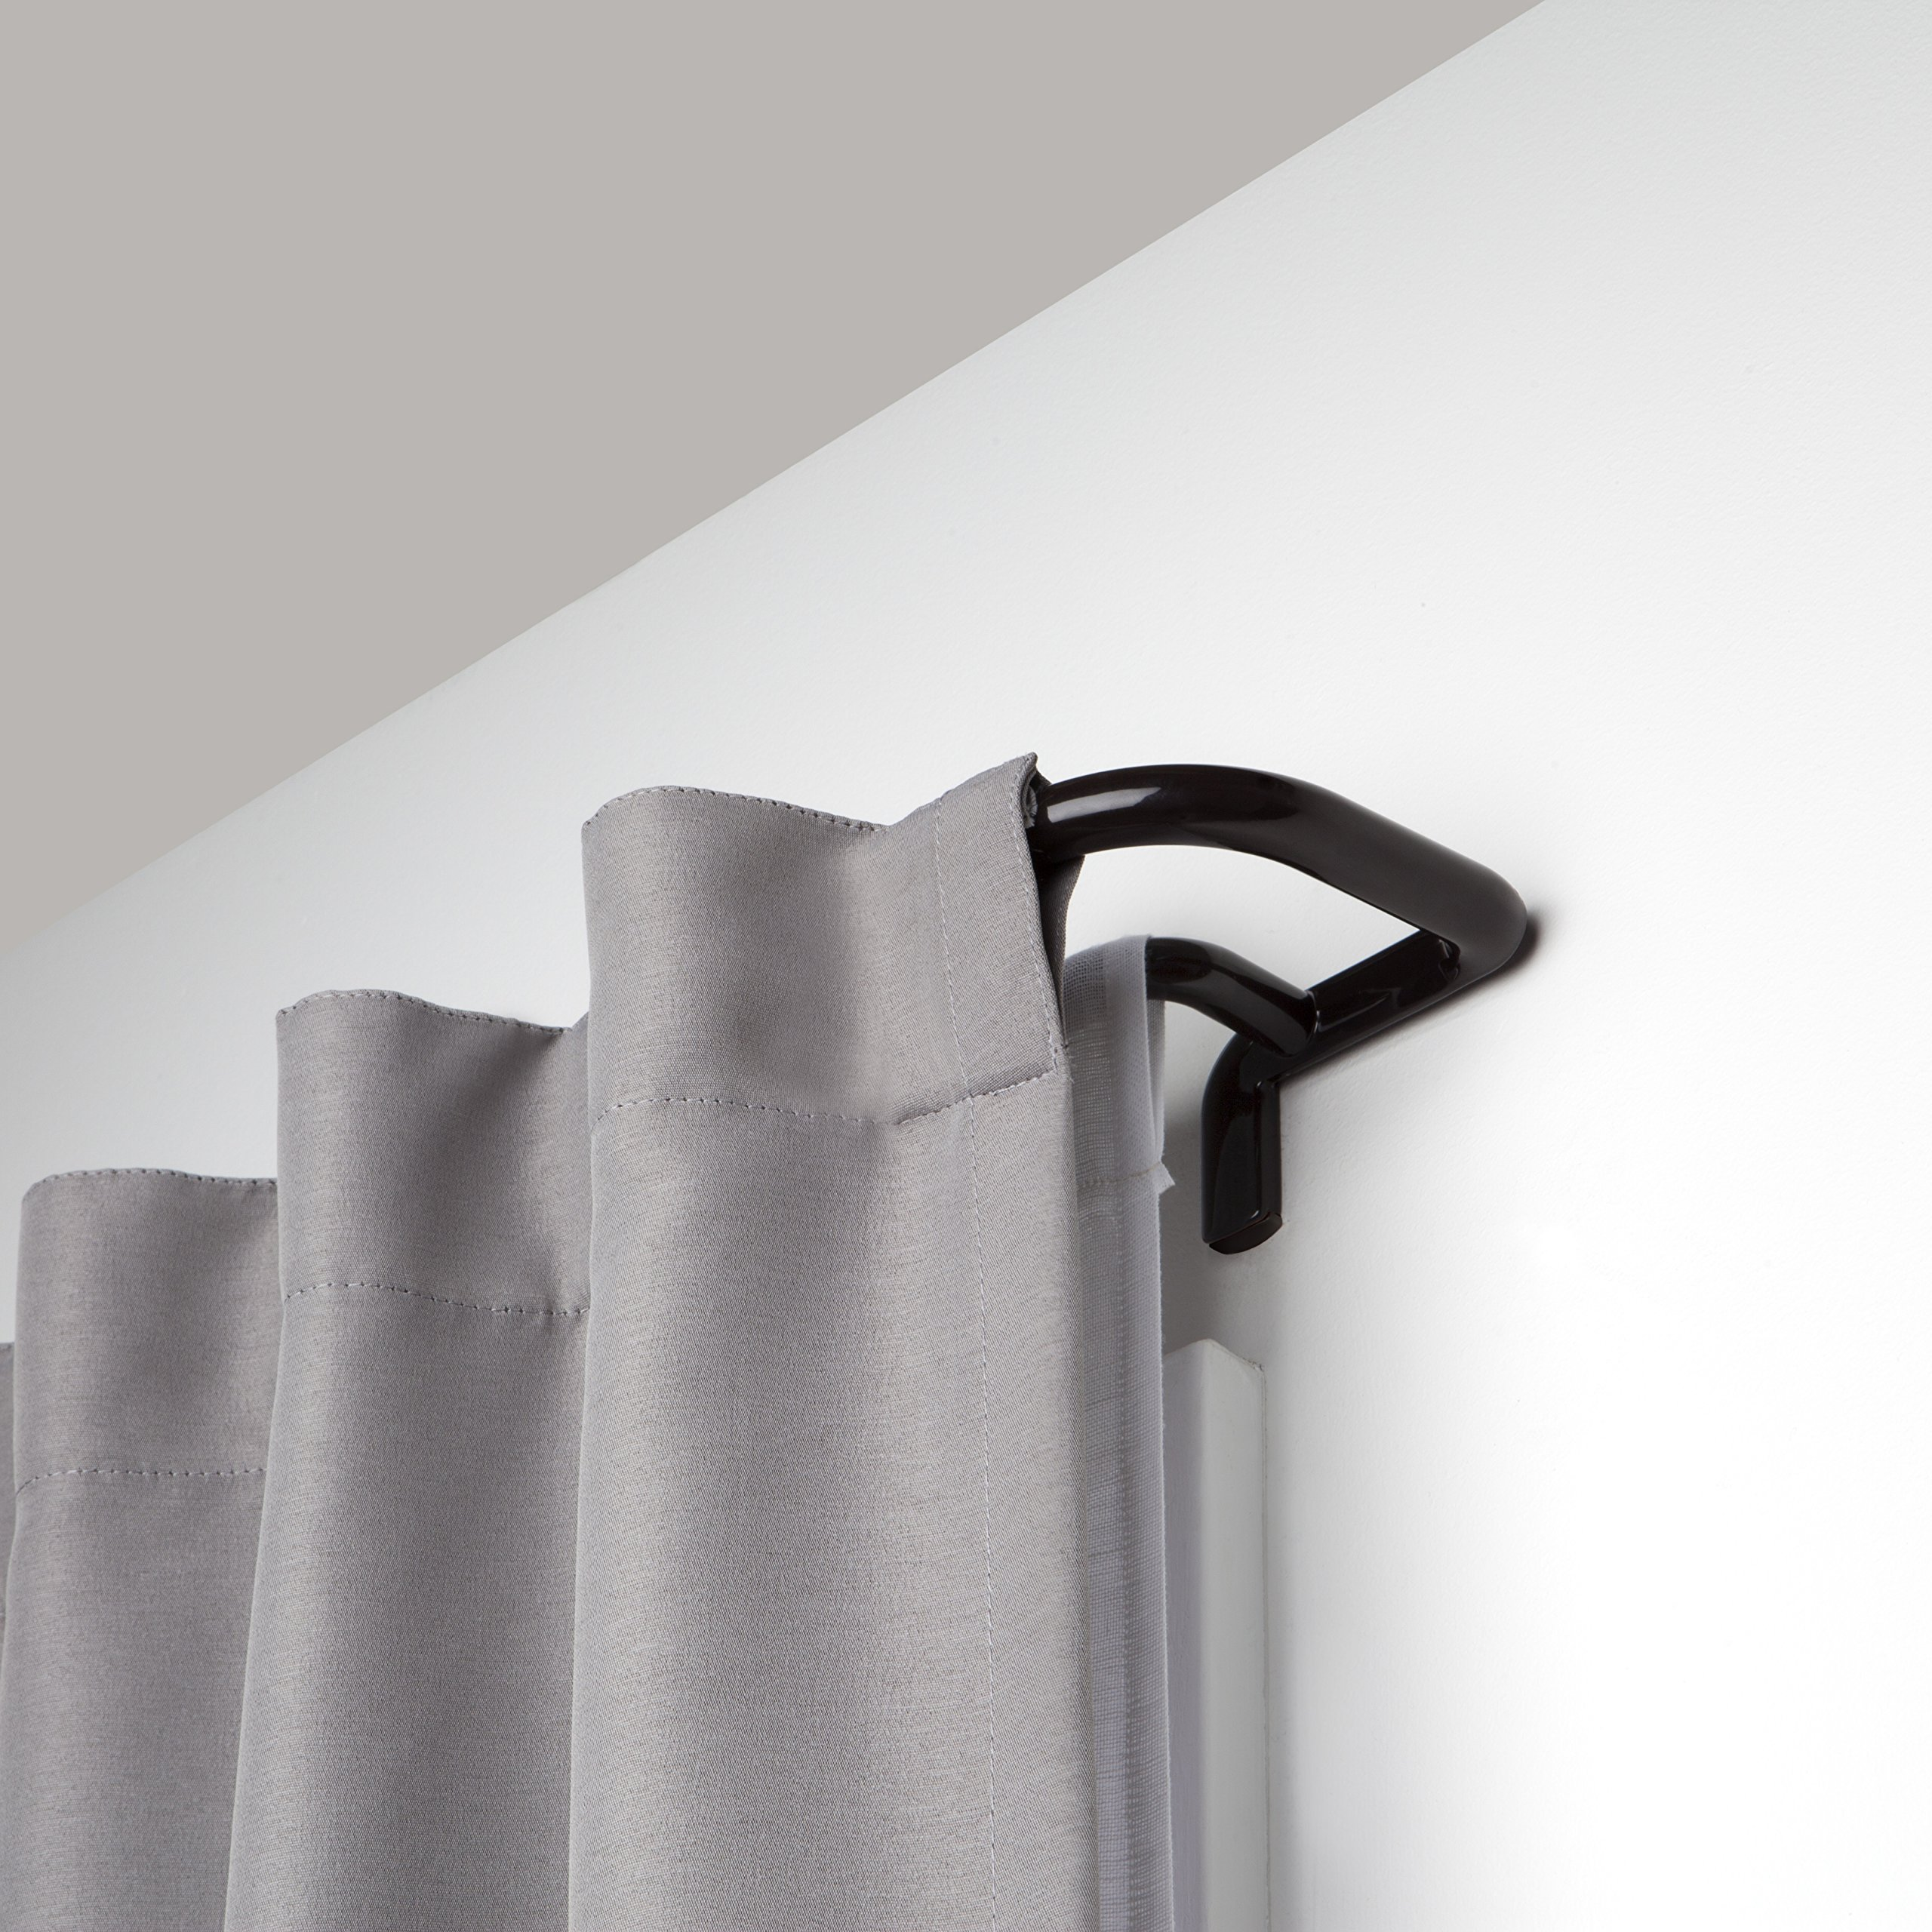 Umbra 1005892-797-REM Twilight Double Rod 48-88'' Twilight Room-Darkening Double Curtain Rod for Window, 48 To 88'' , Auburn Bronze